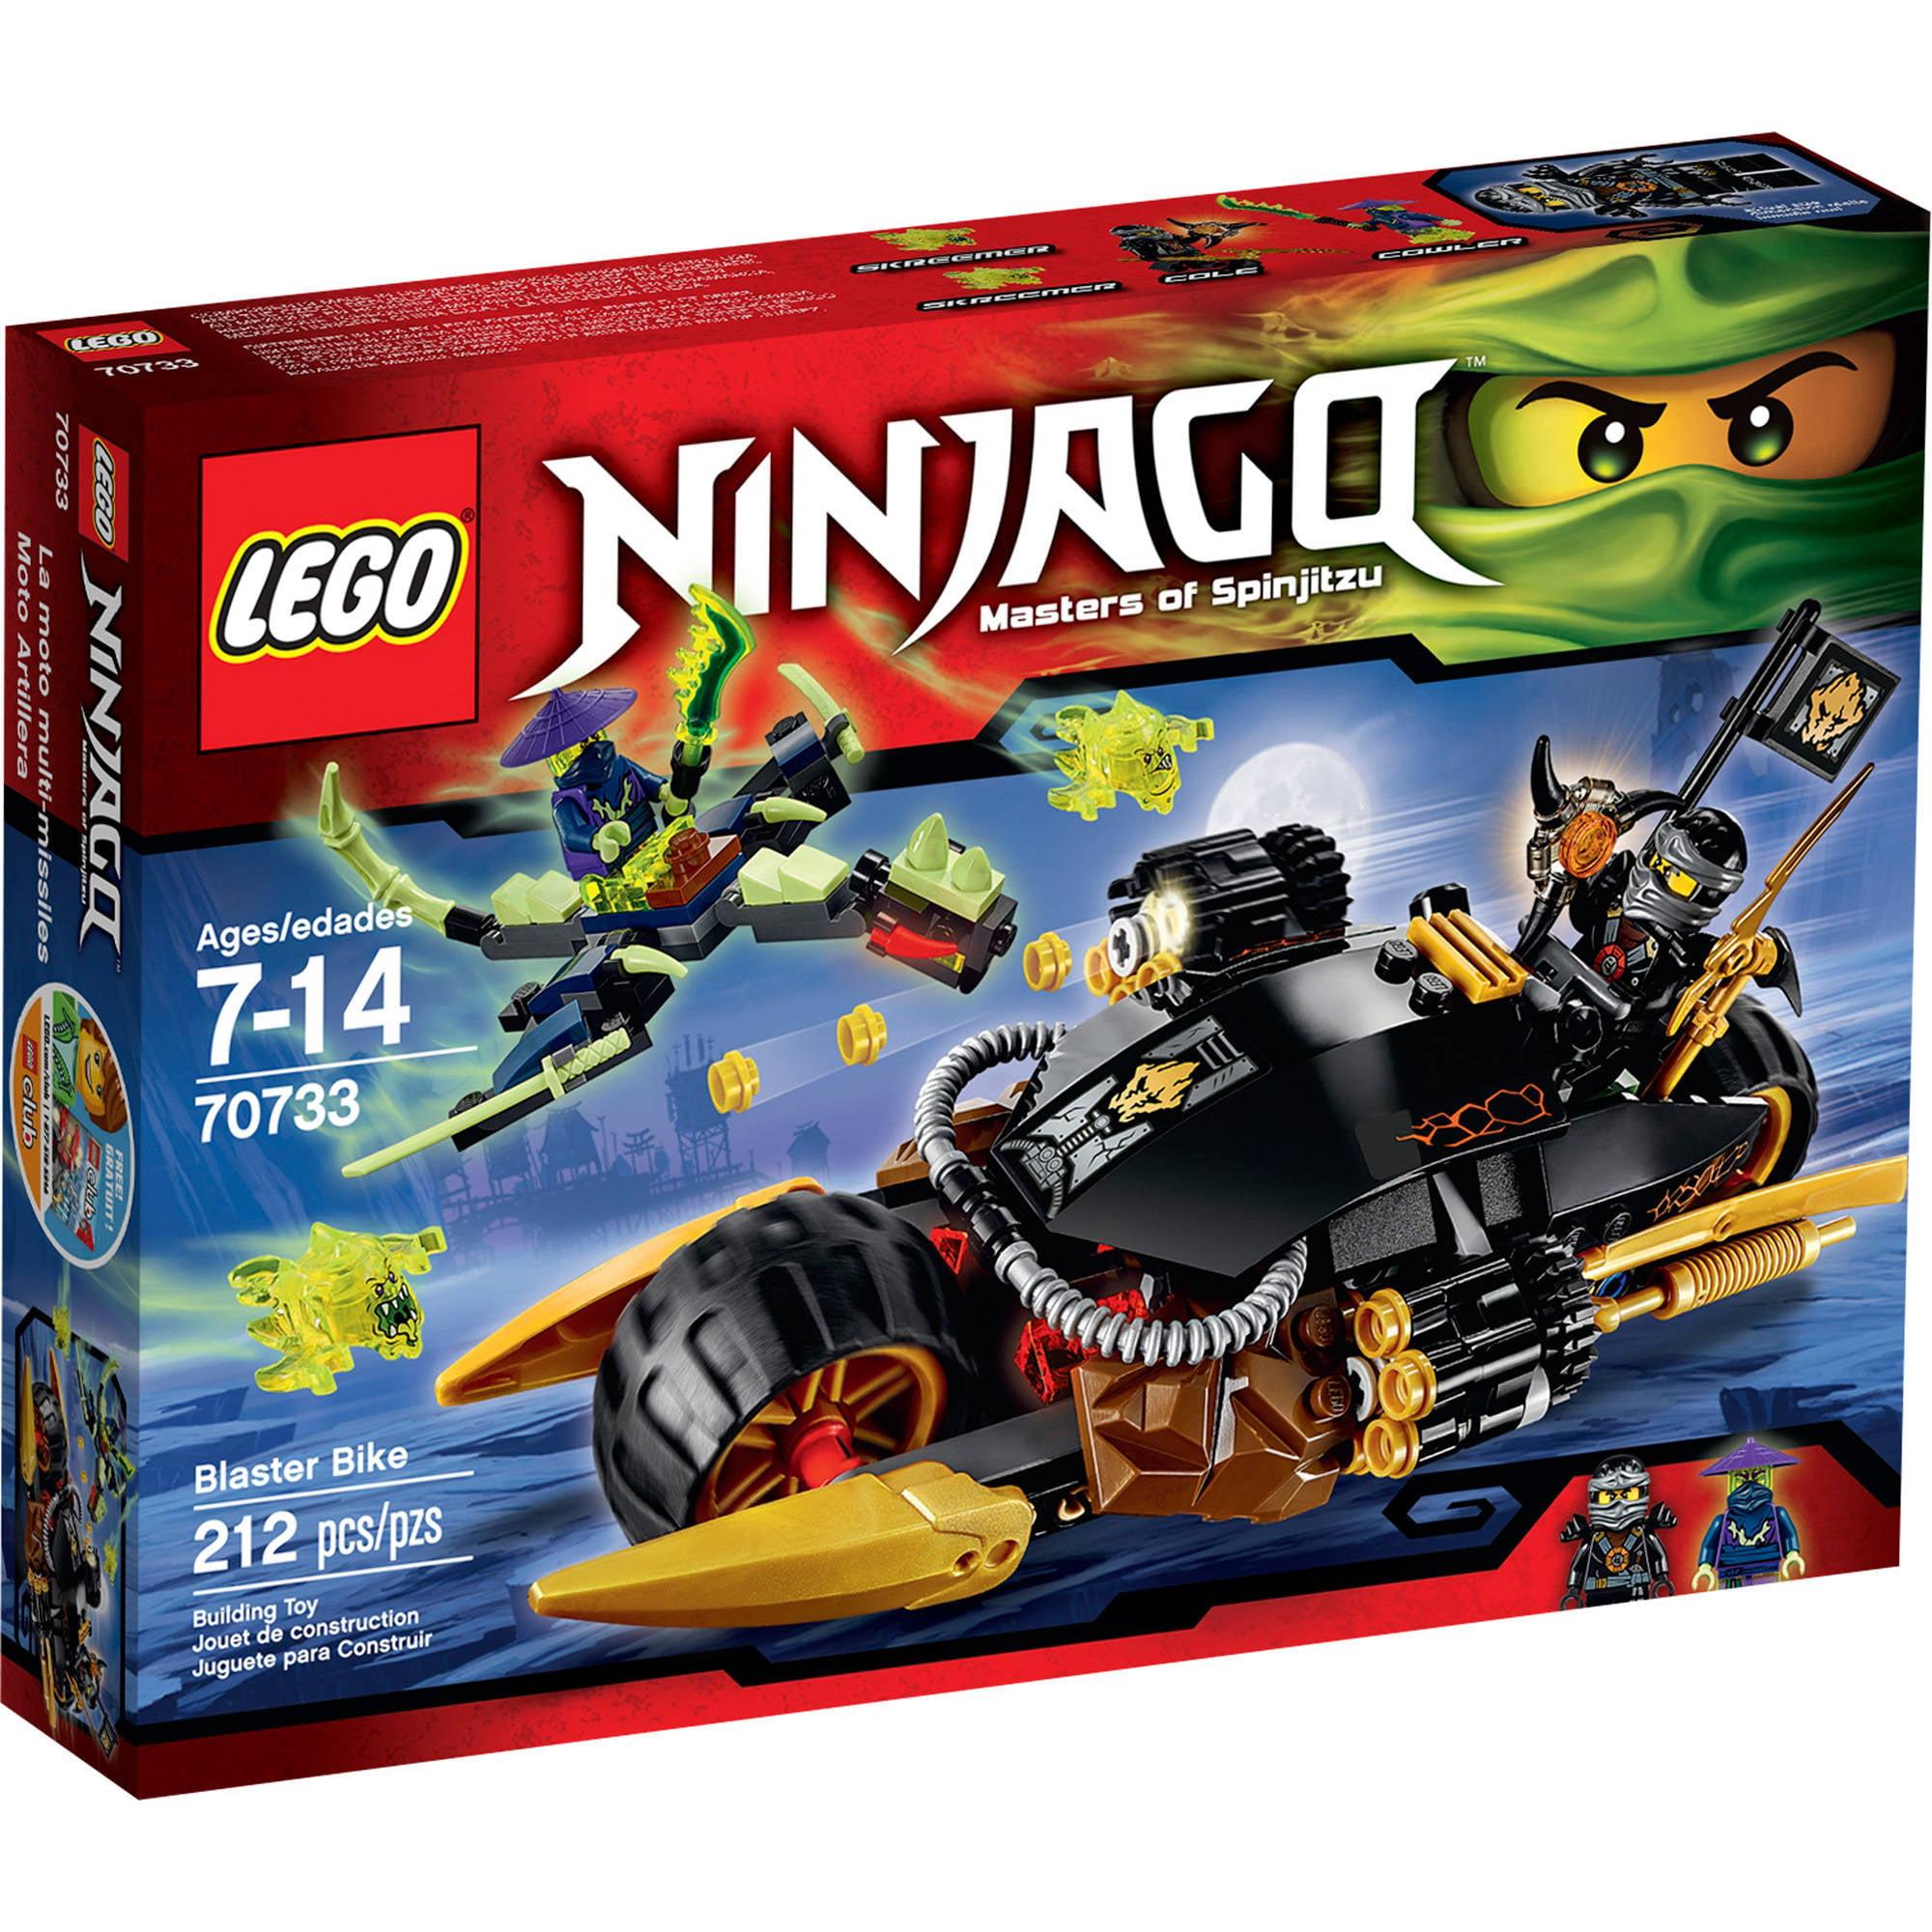 LEGO Ninjago Blaster Bike, 70733